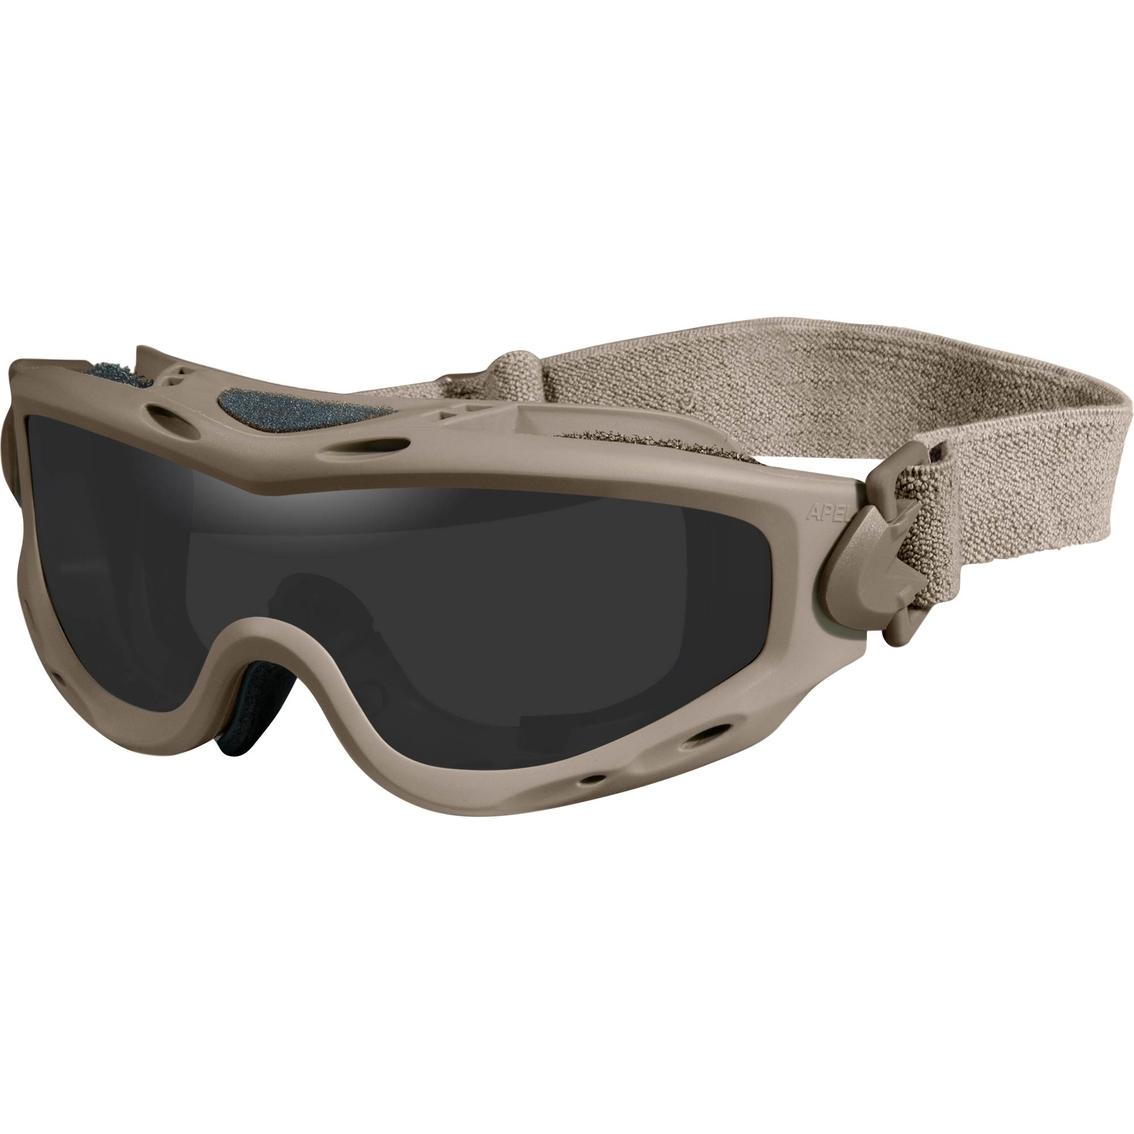 6158161b82 Wiley X Prescription Sunglasses Dealers « One More Soul